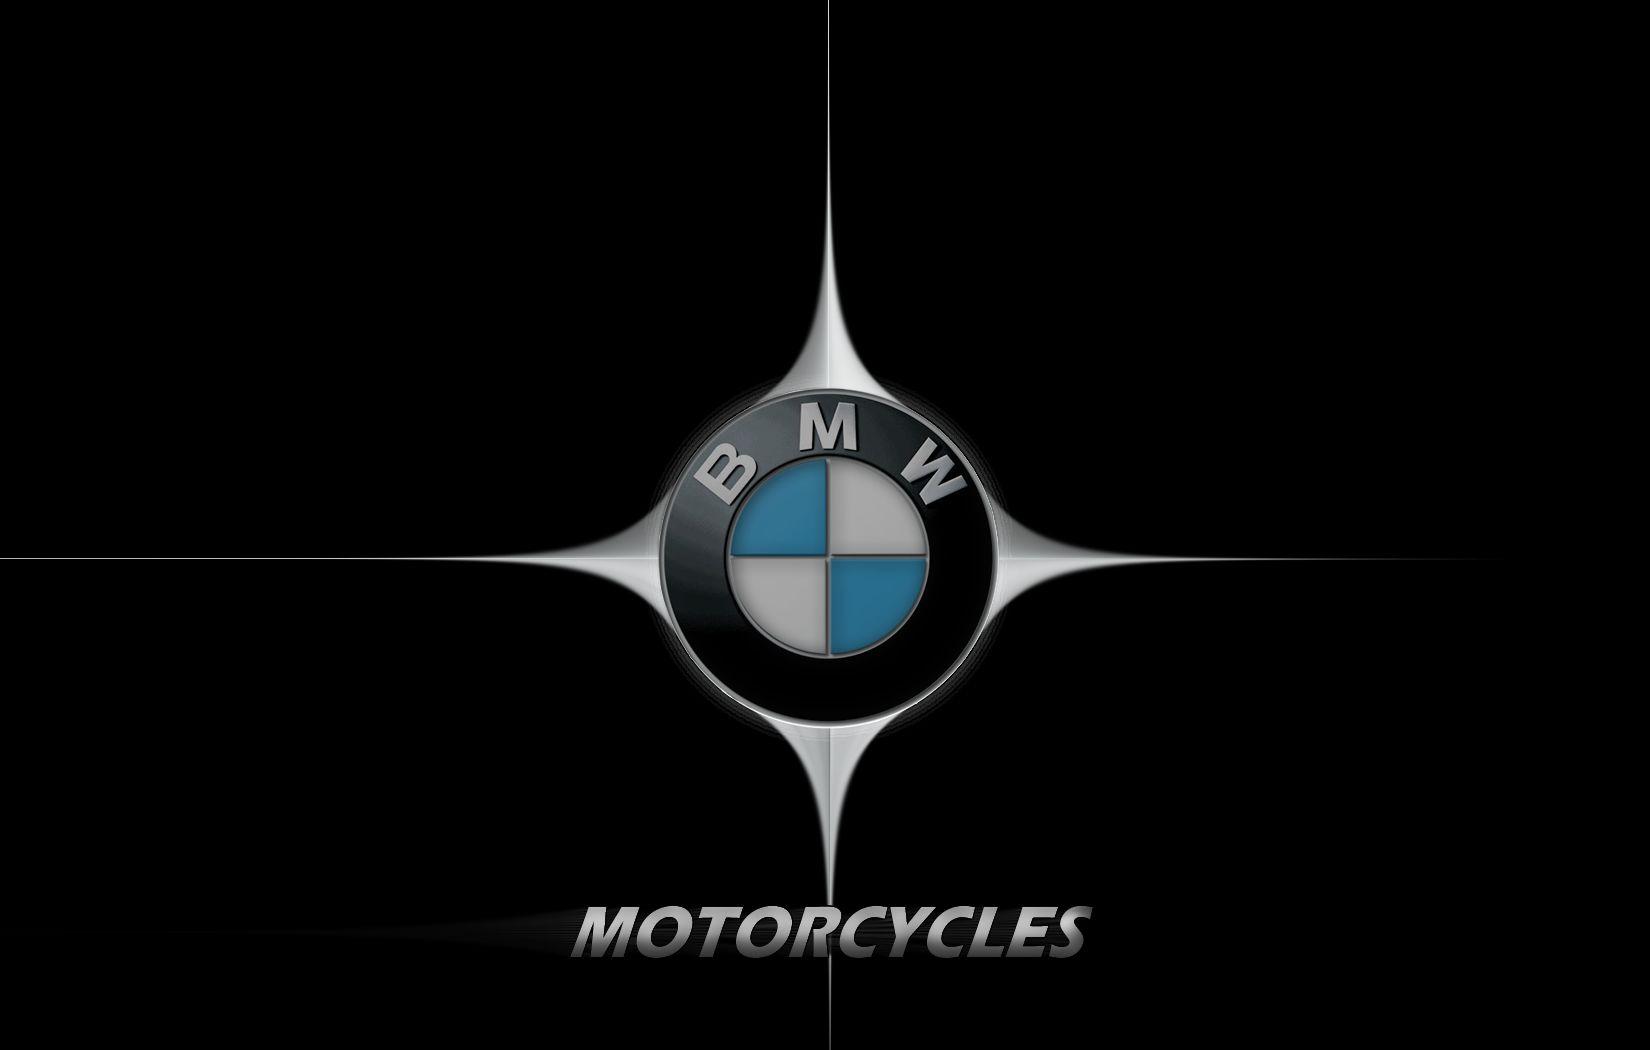 Wallpaper Bmw Motorcycles Voitures Et Motos Voiture Motos